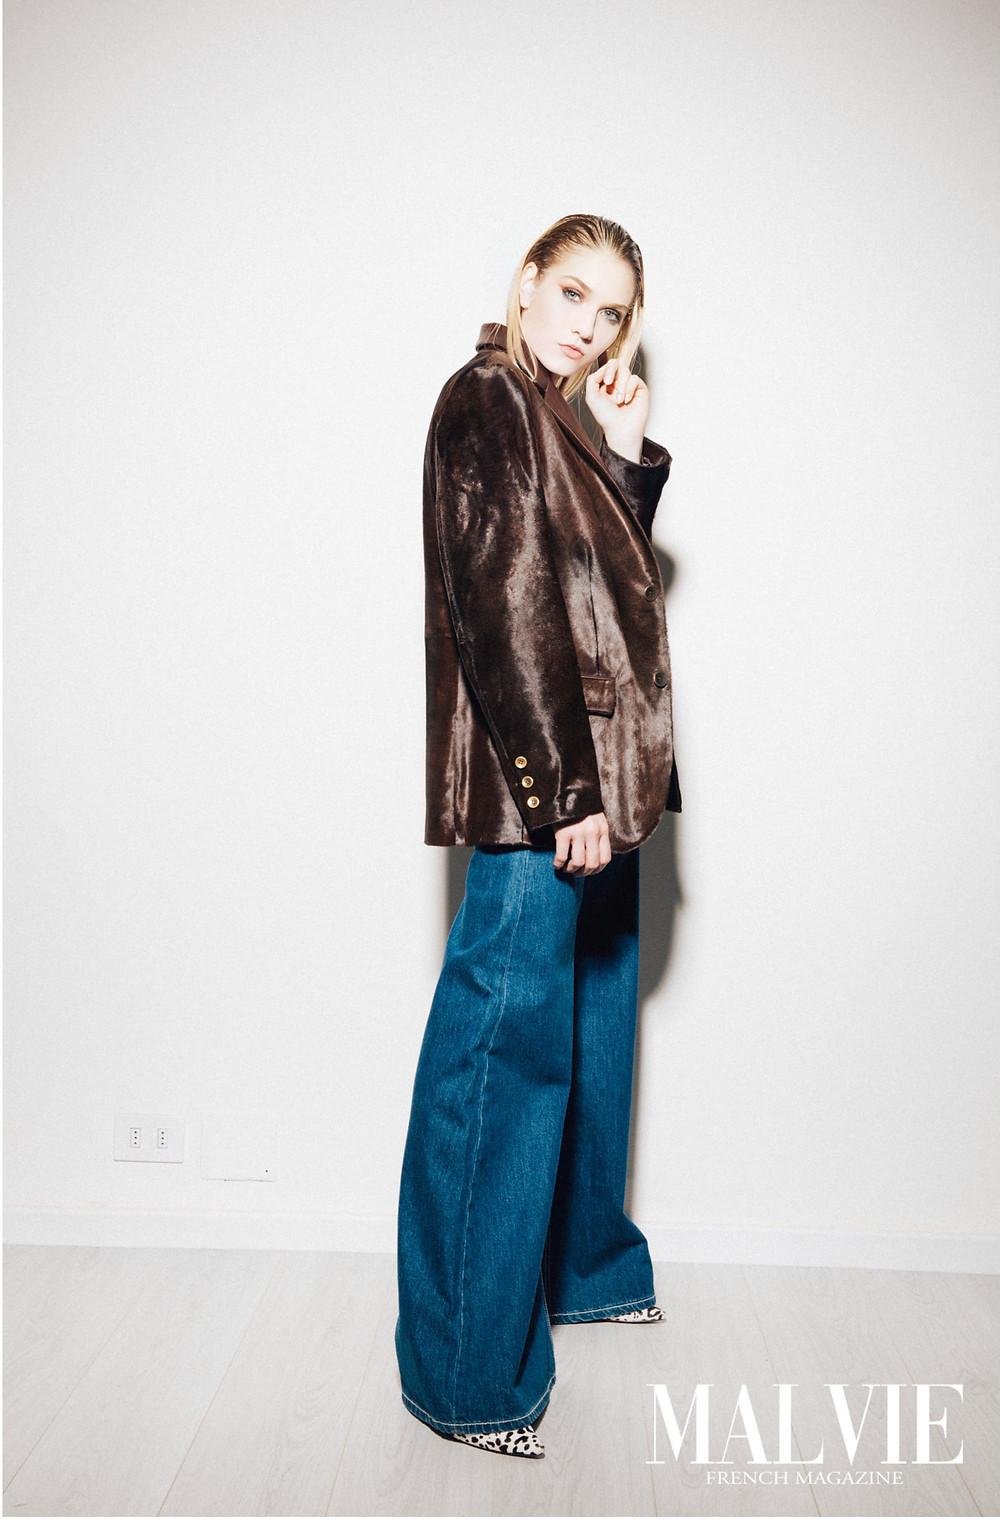 Fashion Designer: Erika Aldinucci Makeup Artist: Ilaria Guidi Photographer: Dadox Female Model: Anna Sadykova Wardrobe Stylist: Greta Gramigni